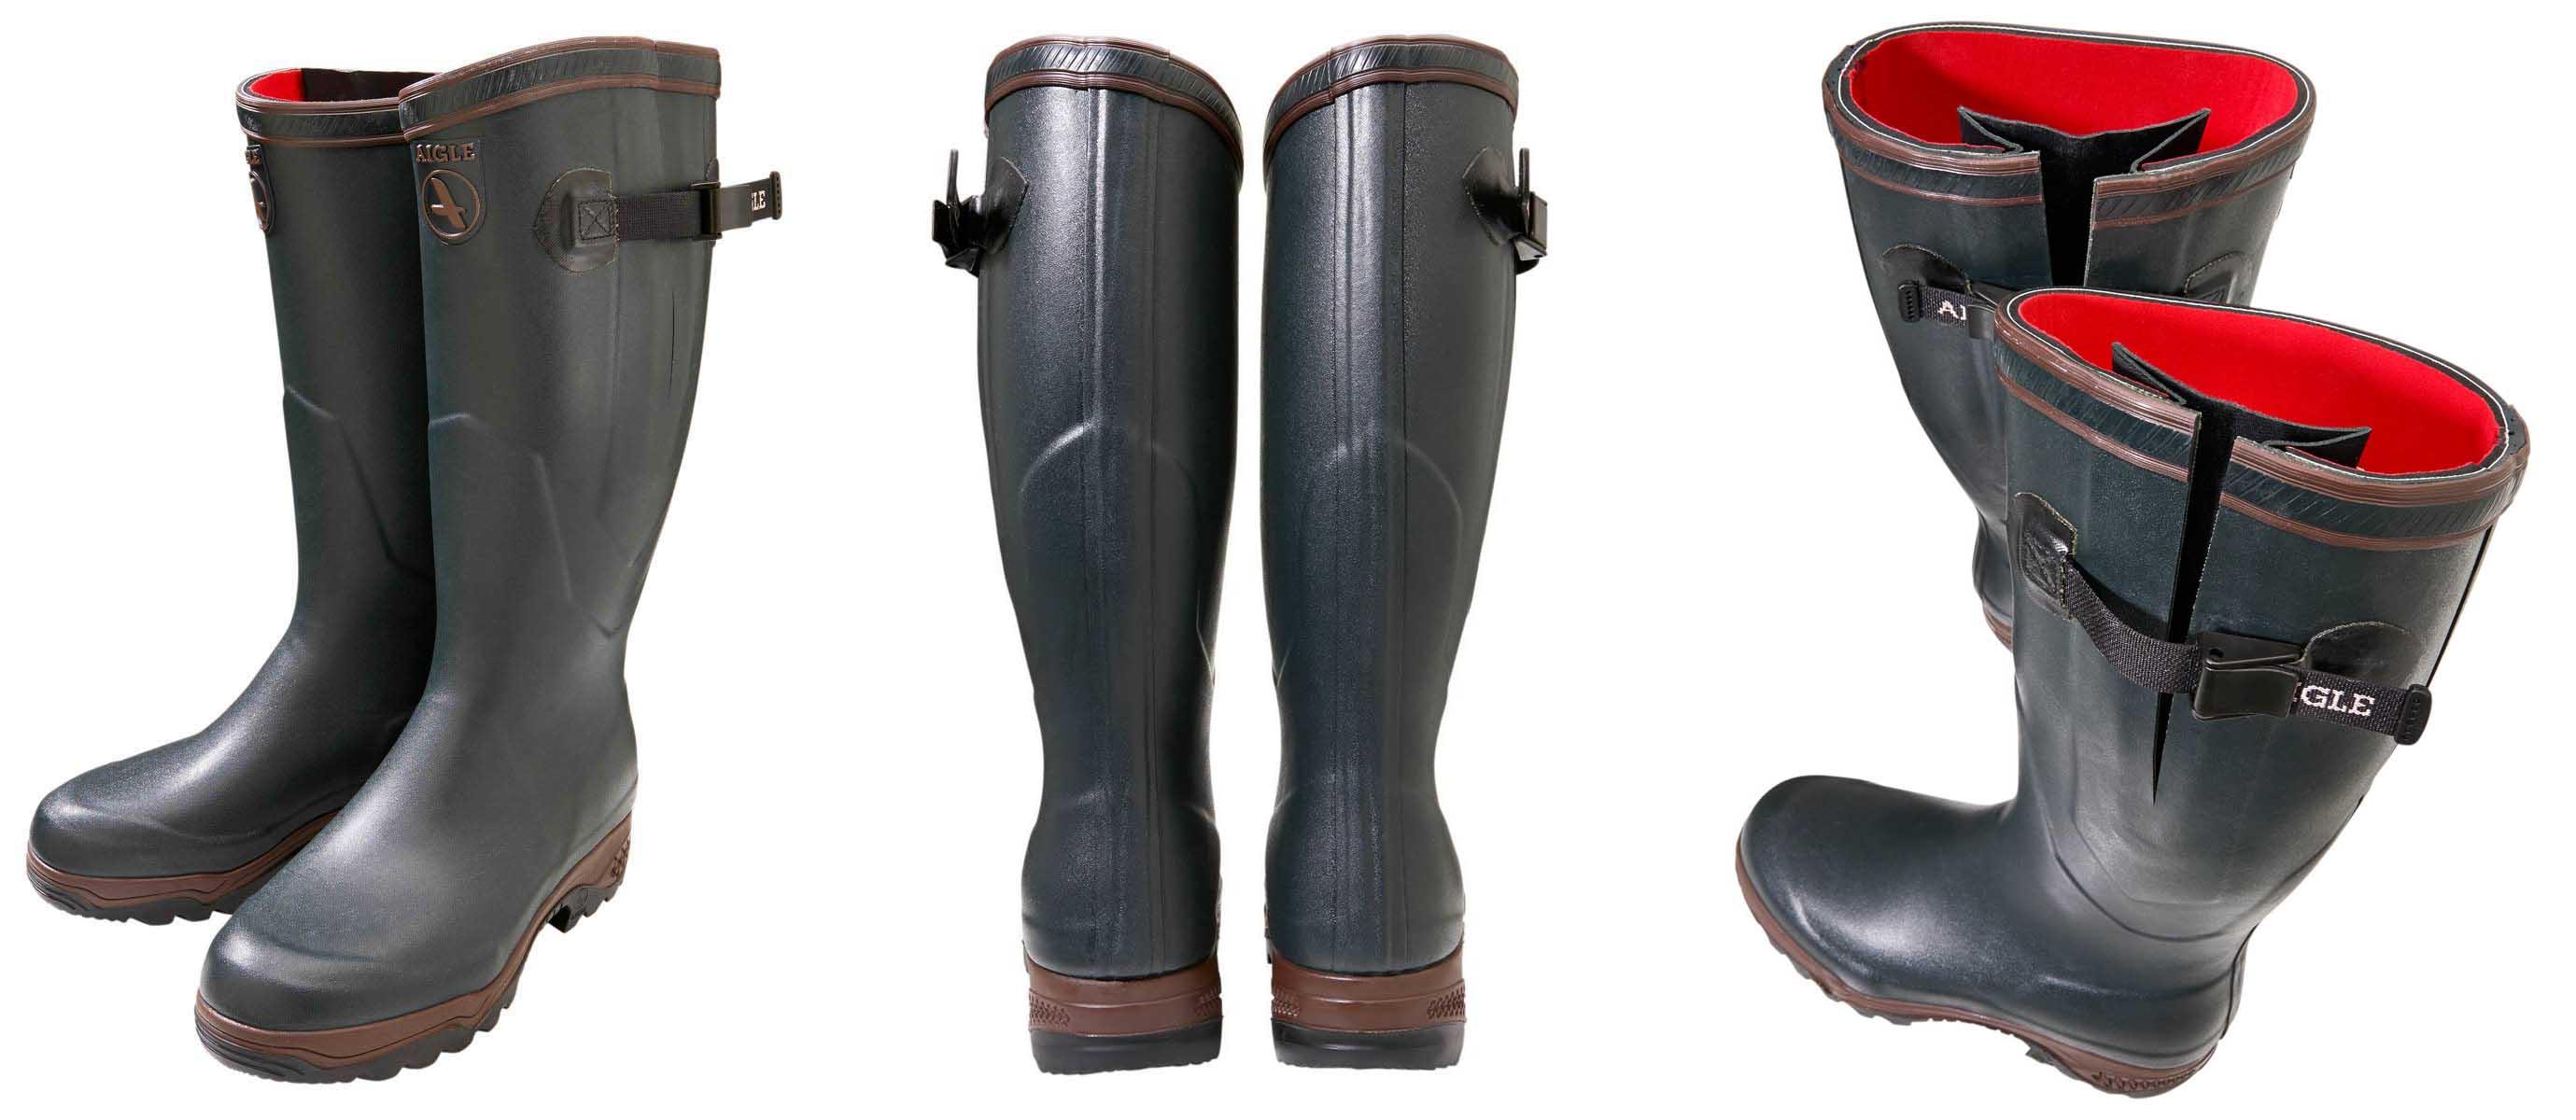 Aigle Boots- Aigle Parcours Iso 2